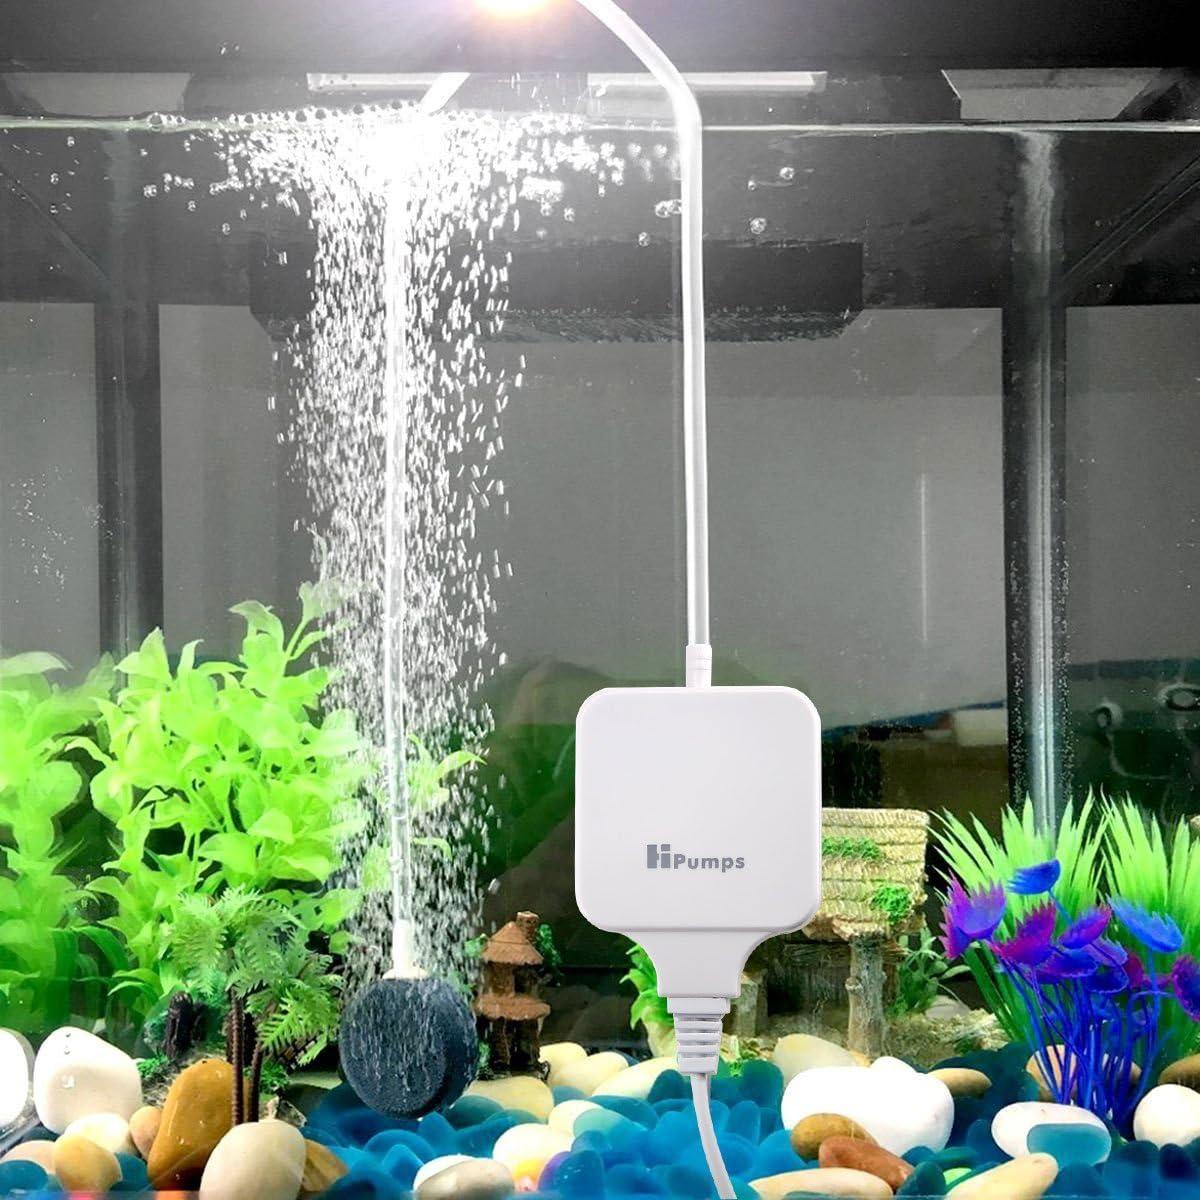 Super Silent High Efficient Oxygen Breathe Water Air Pump for Fish Tank with Filter Air Stone and Tube Hpumps Aquarium Air Pump